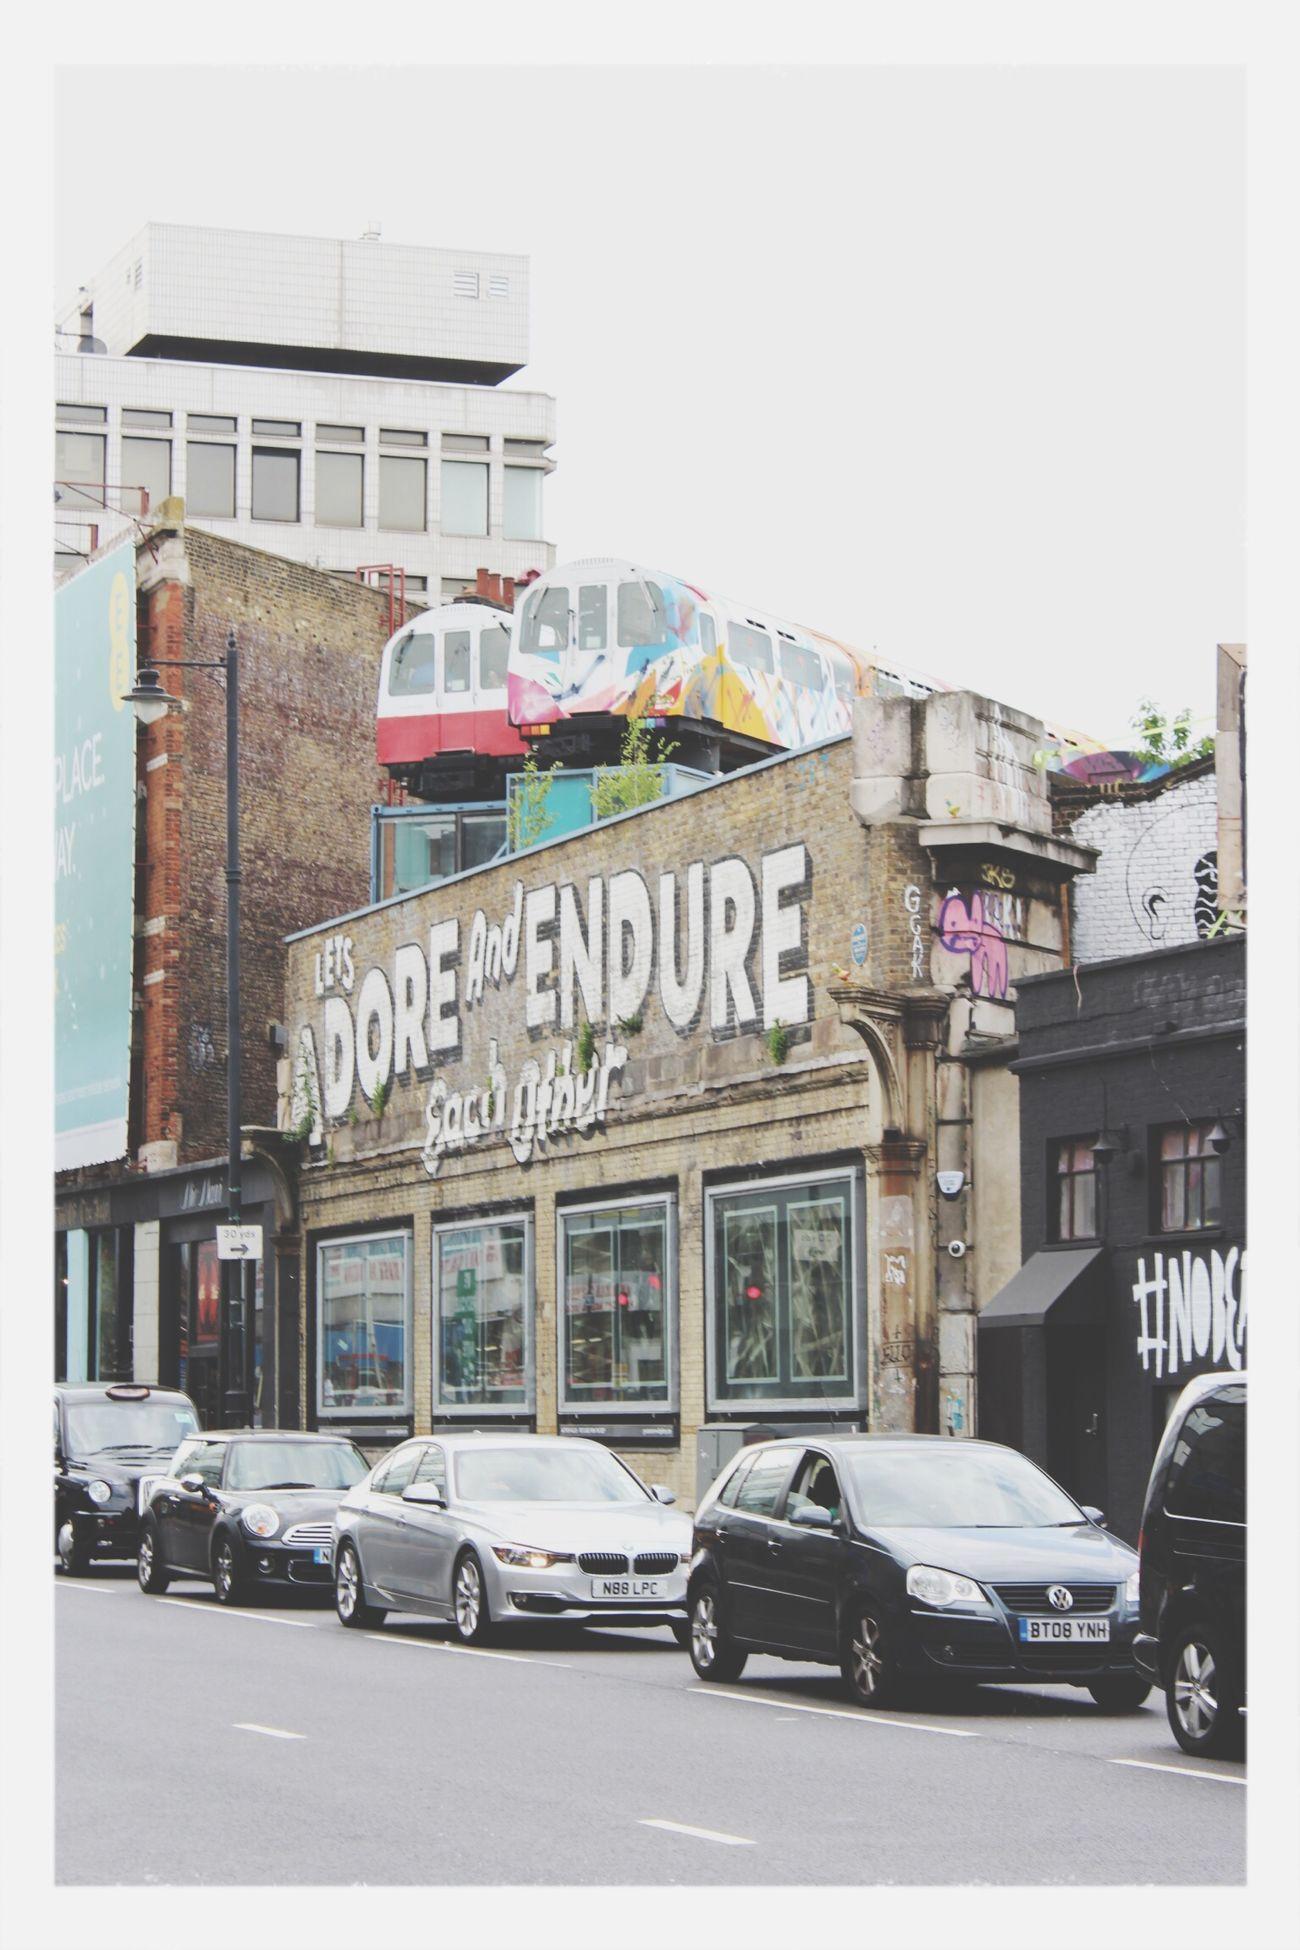 Adore Endurance Buildings